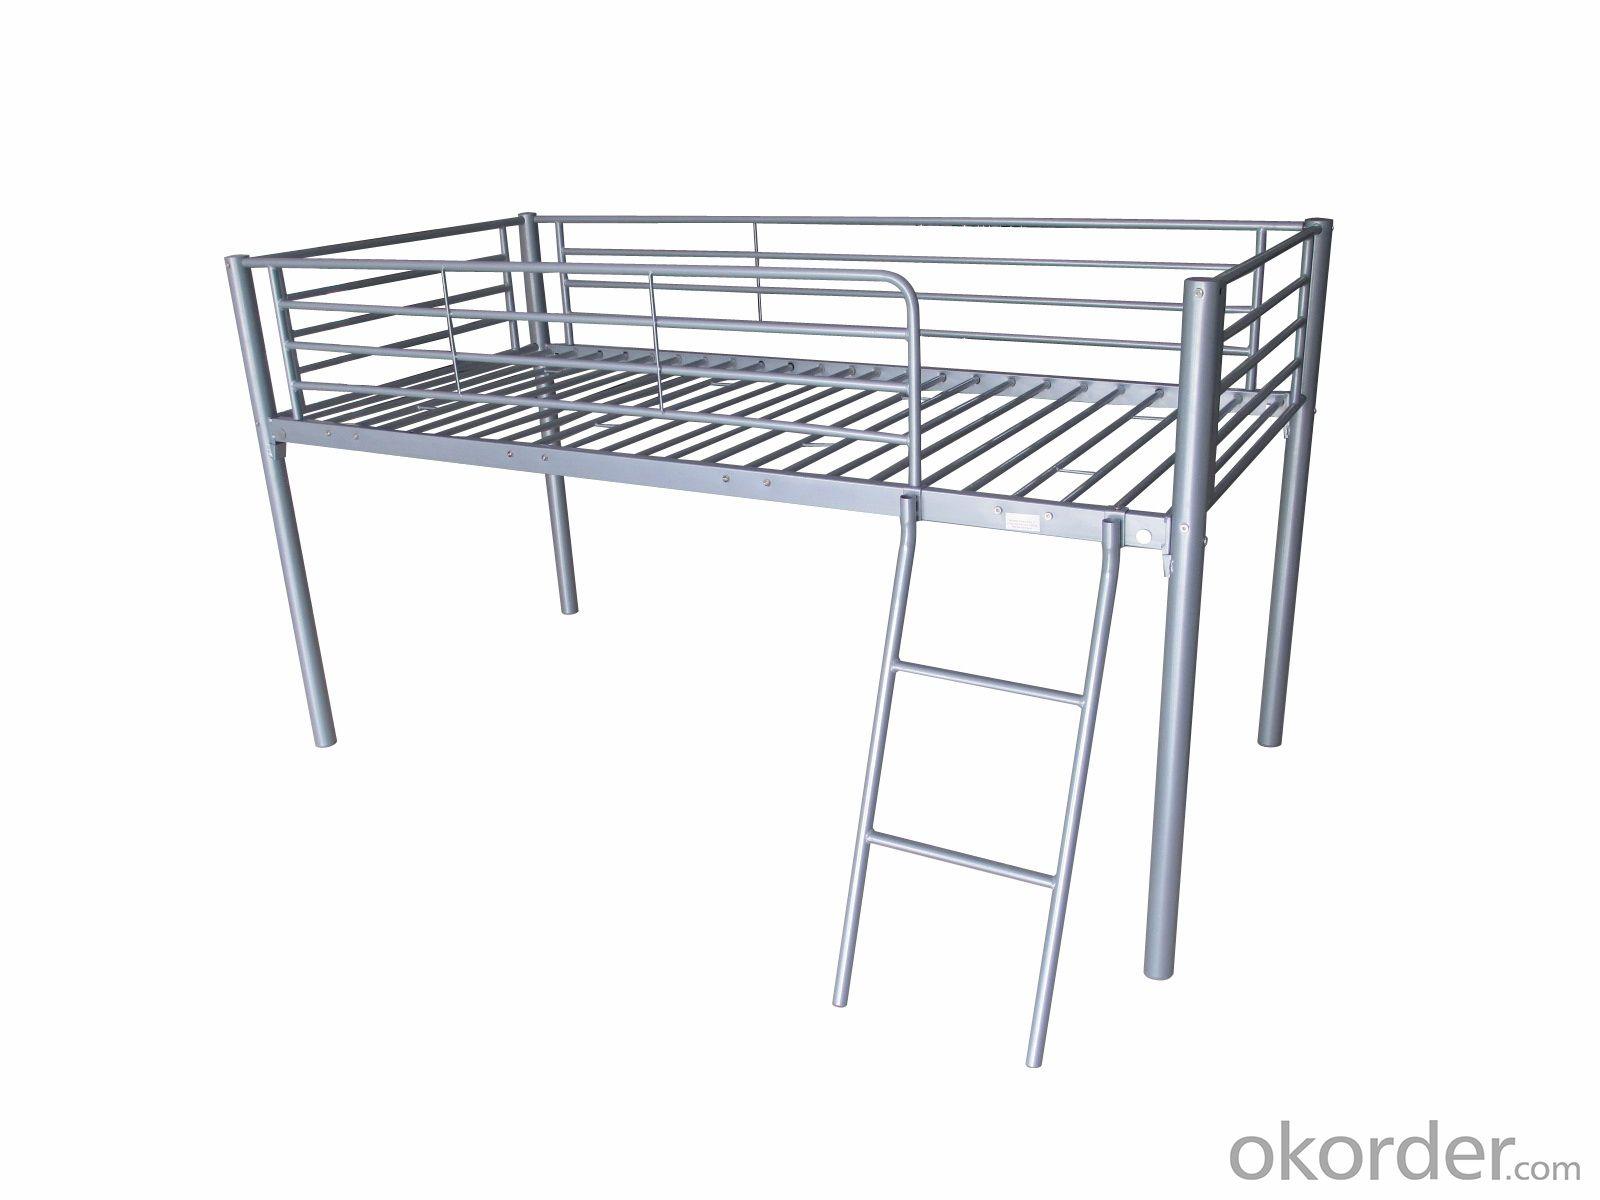 Hot Sale Metal Bunk Beds/Metal Beds Frame/Dormitory Bed MB-169